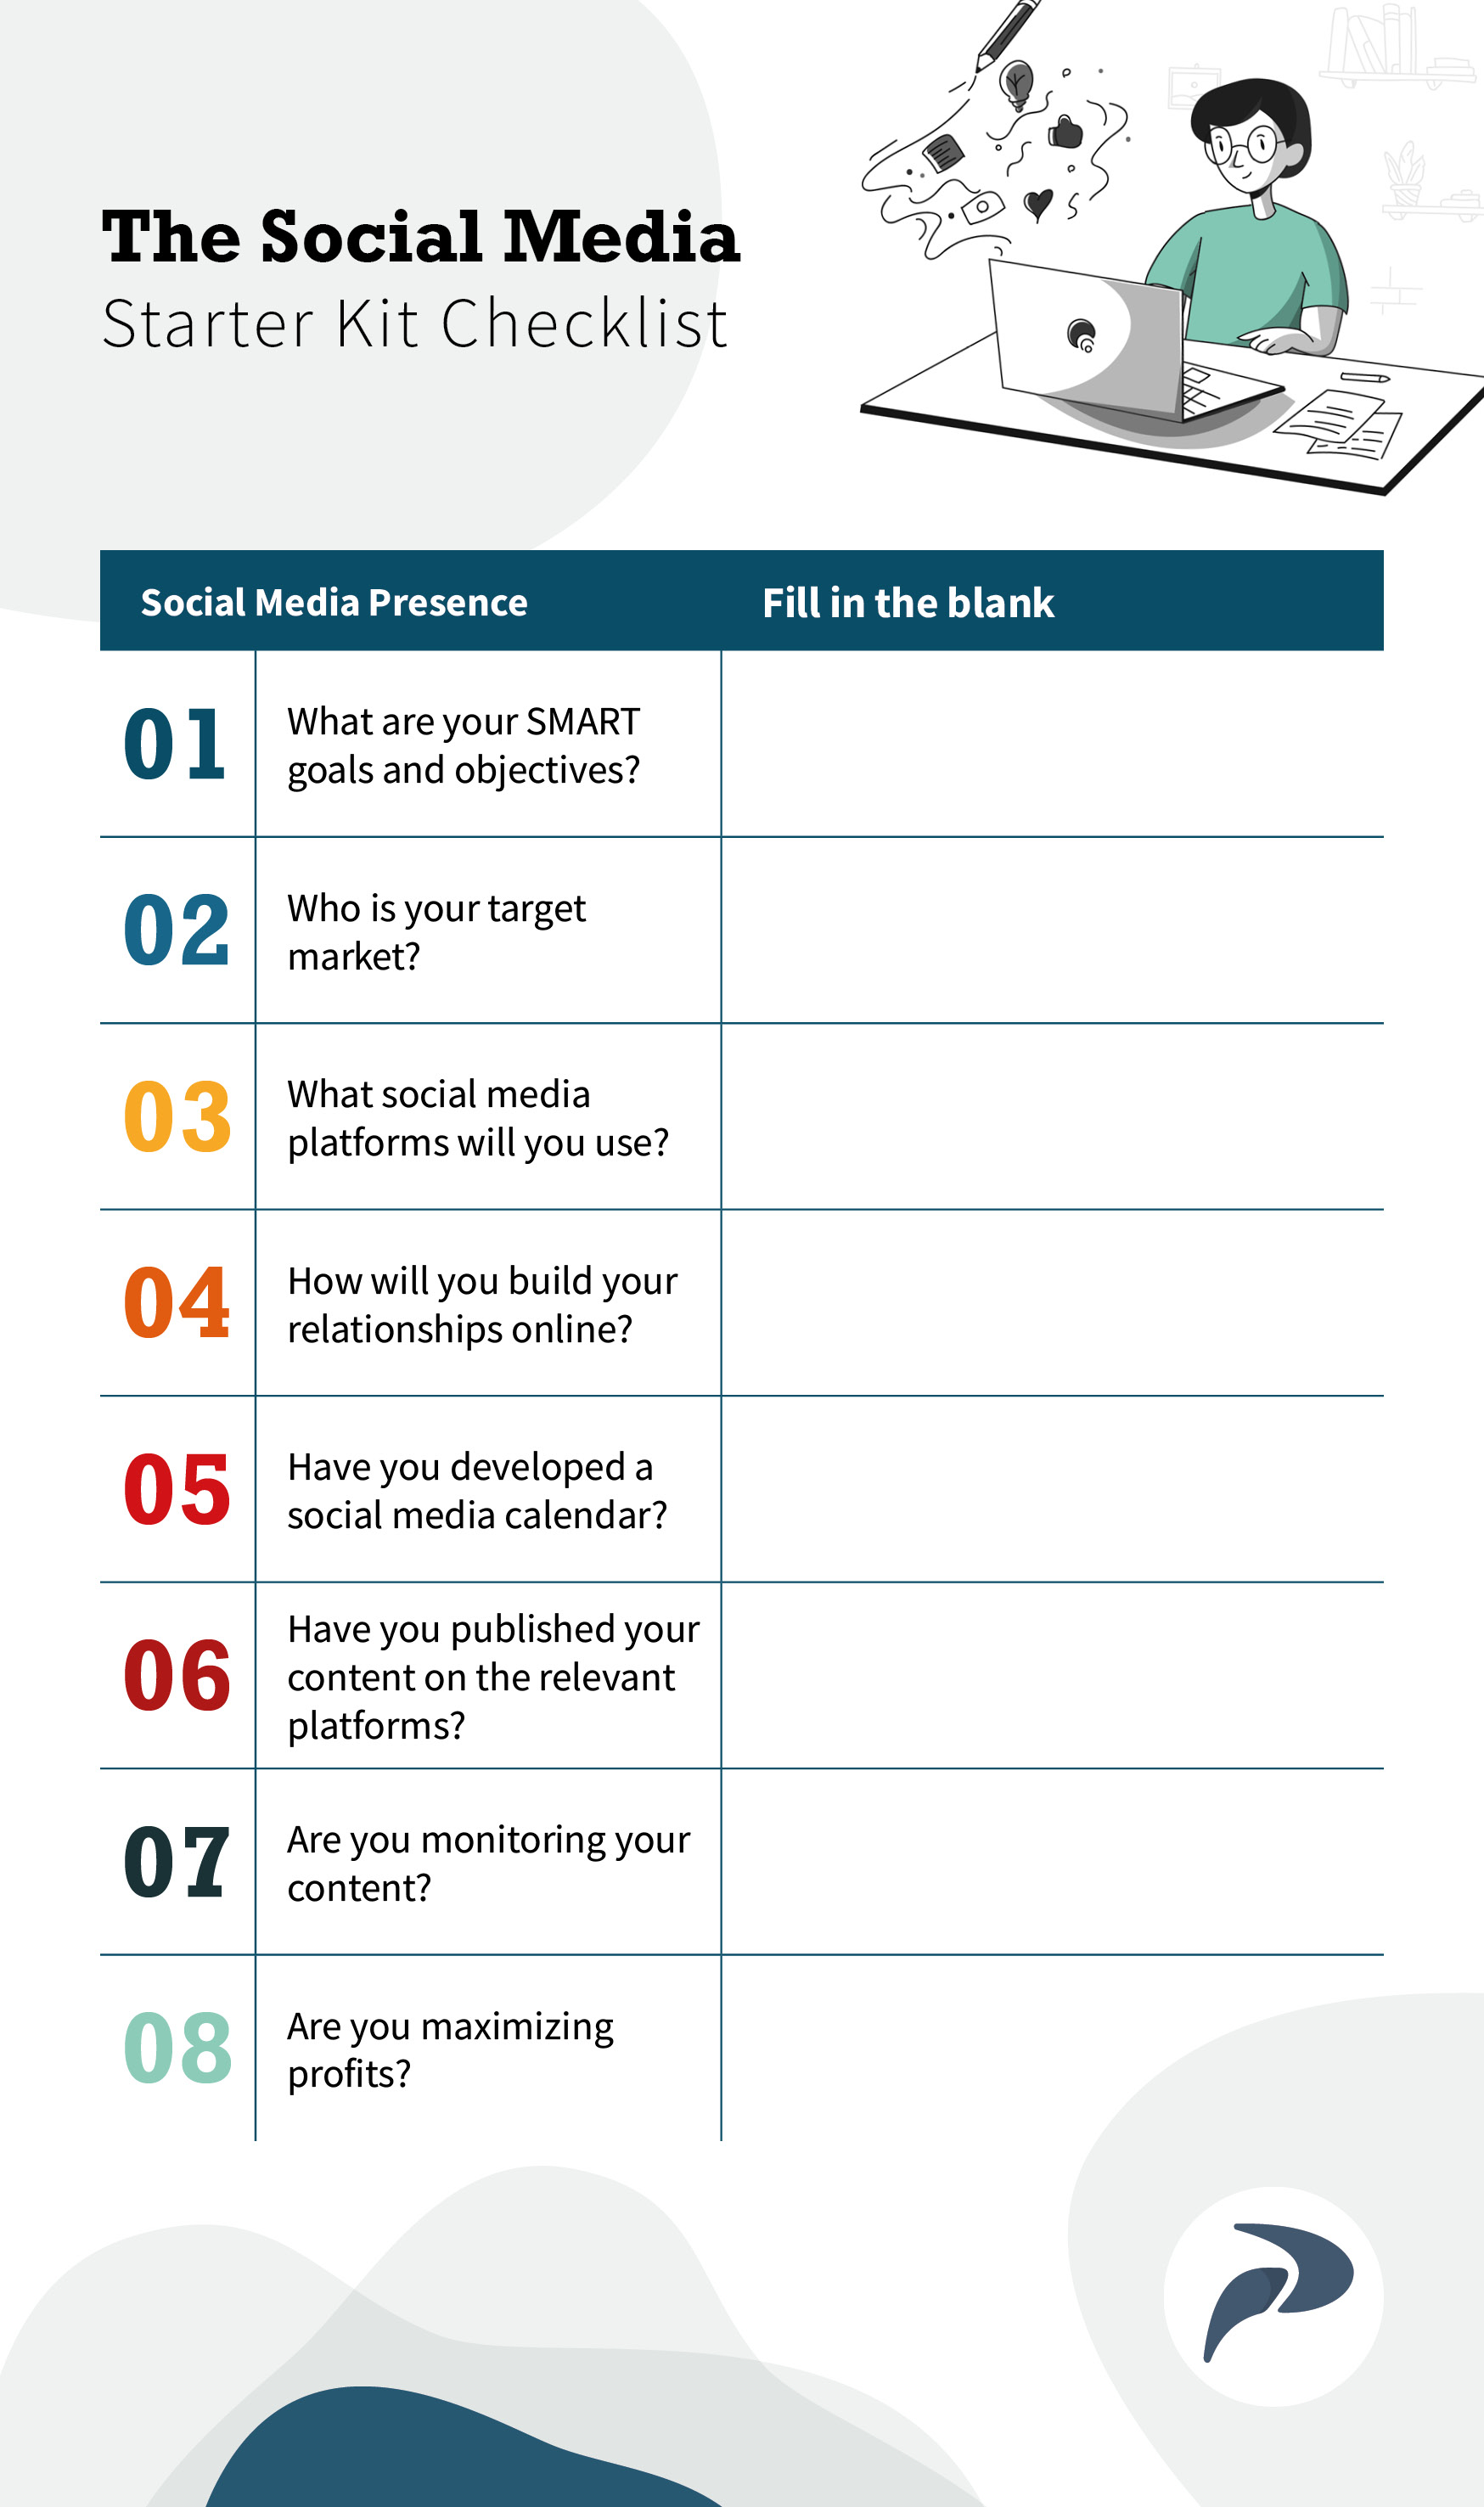 16105_13144_Internal Marketing Penquin_The Social Media Starter Kit Checklist